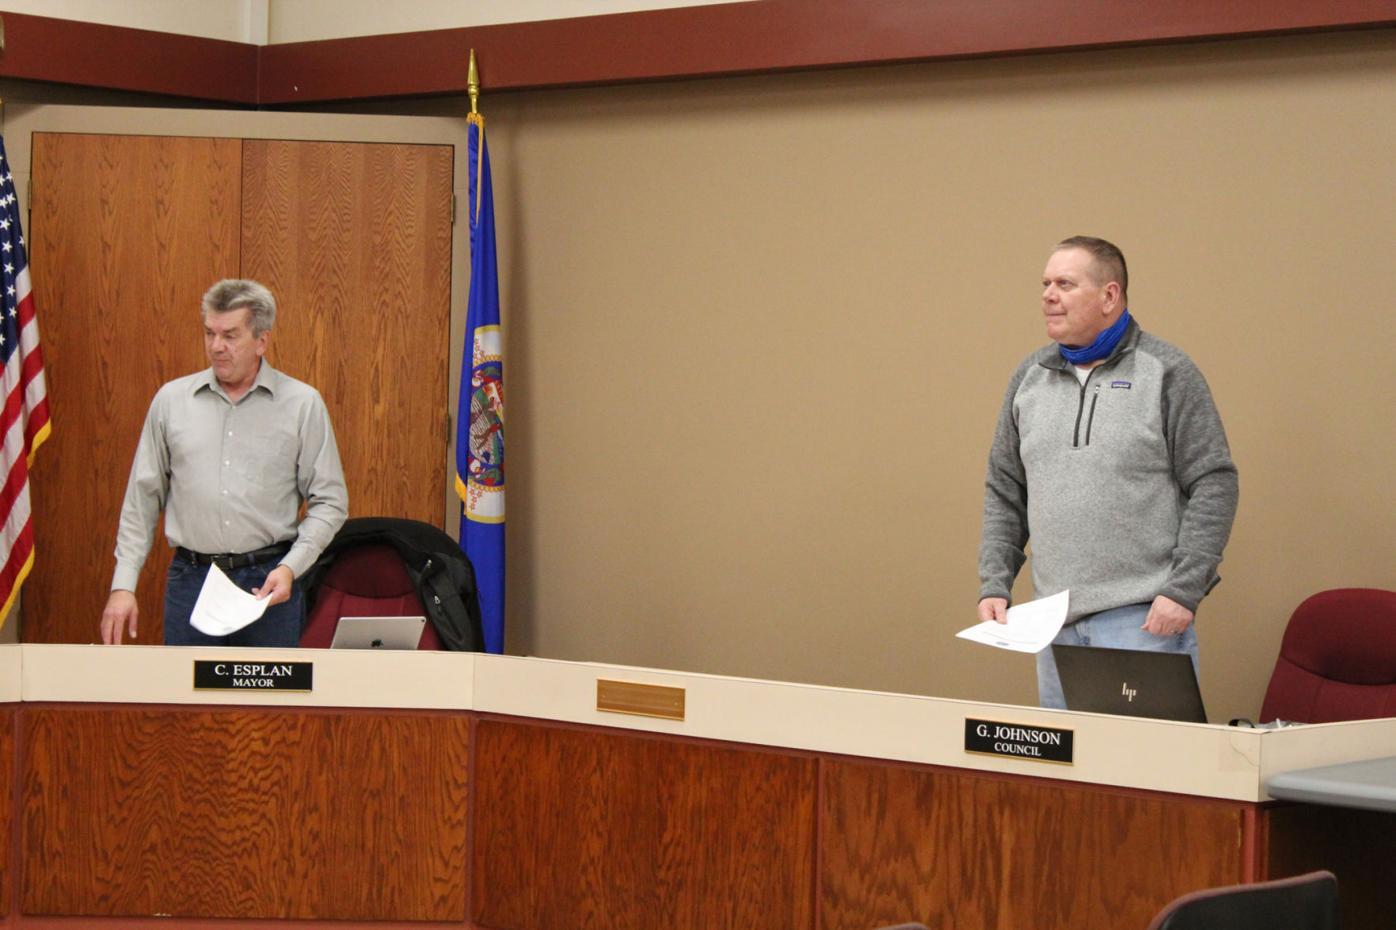 Blooming Prairie Council swears in Esplan Johnson